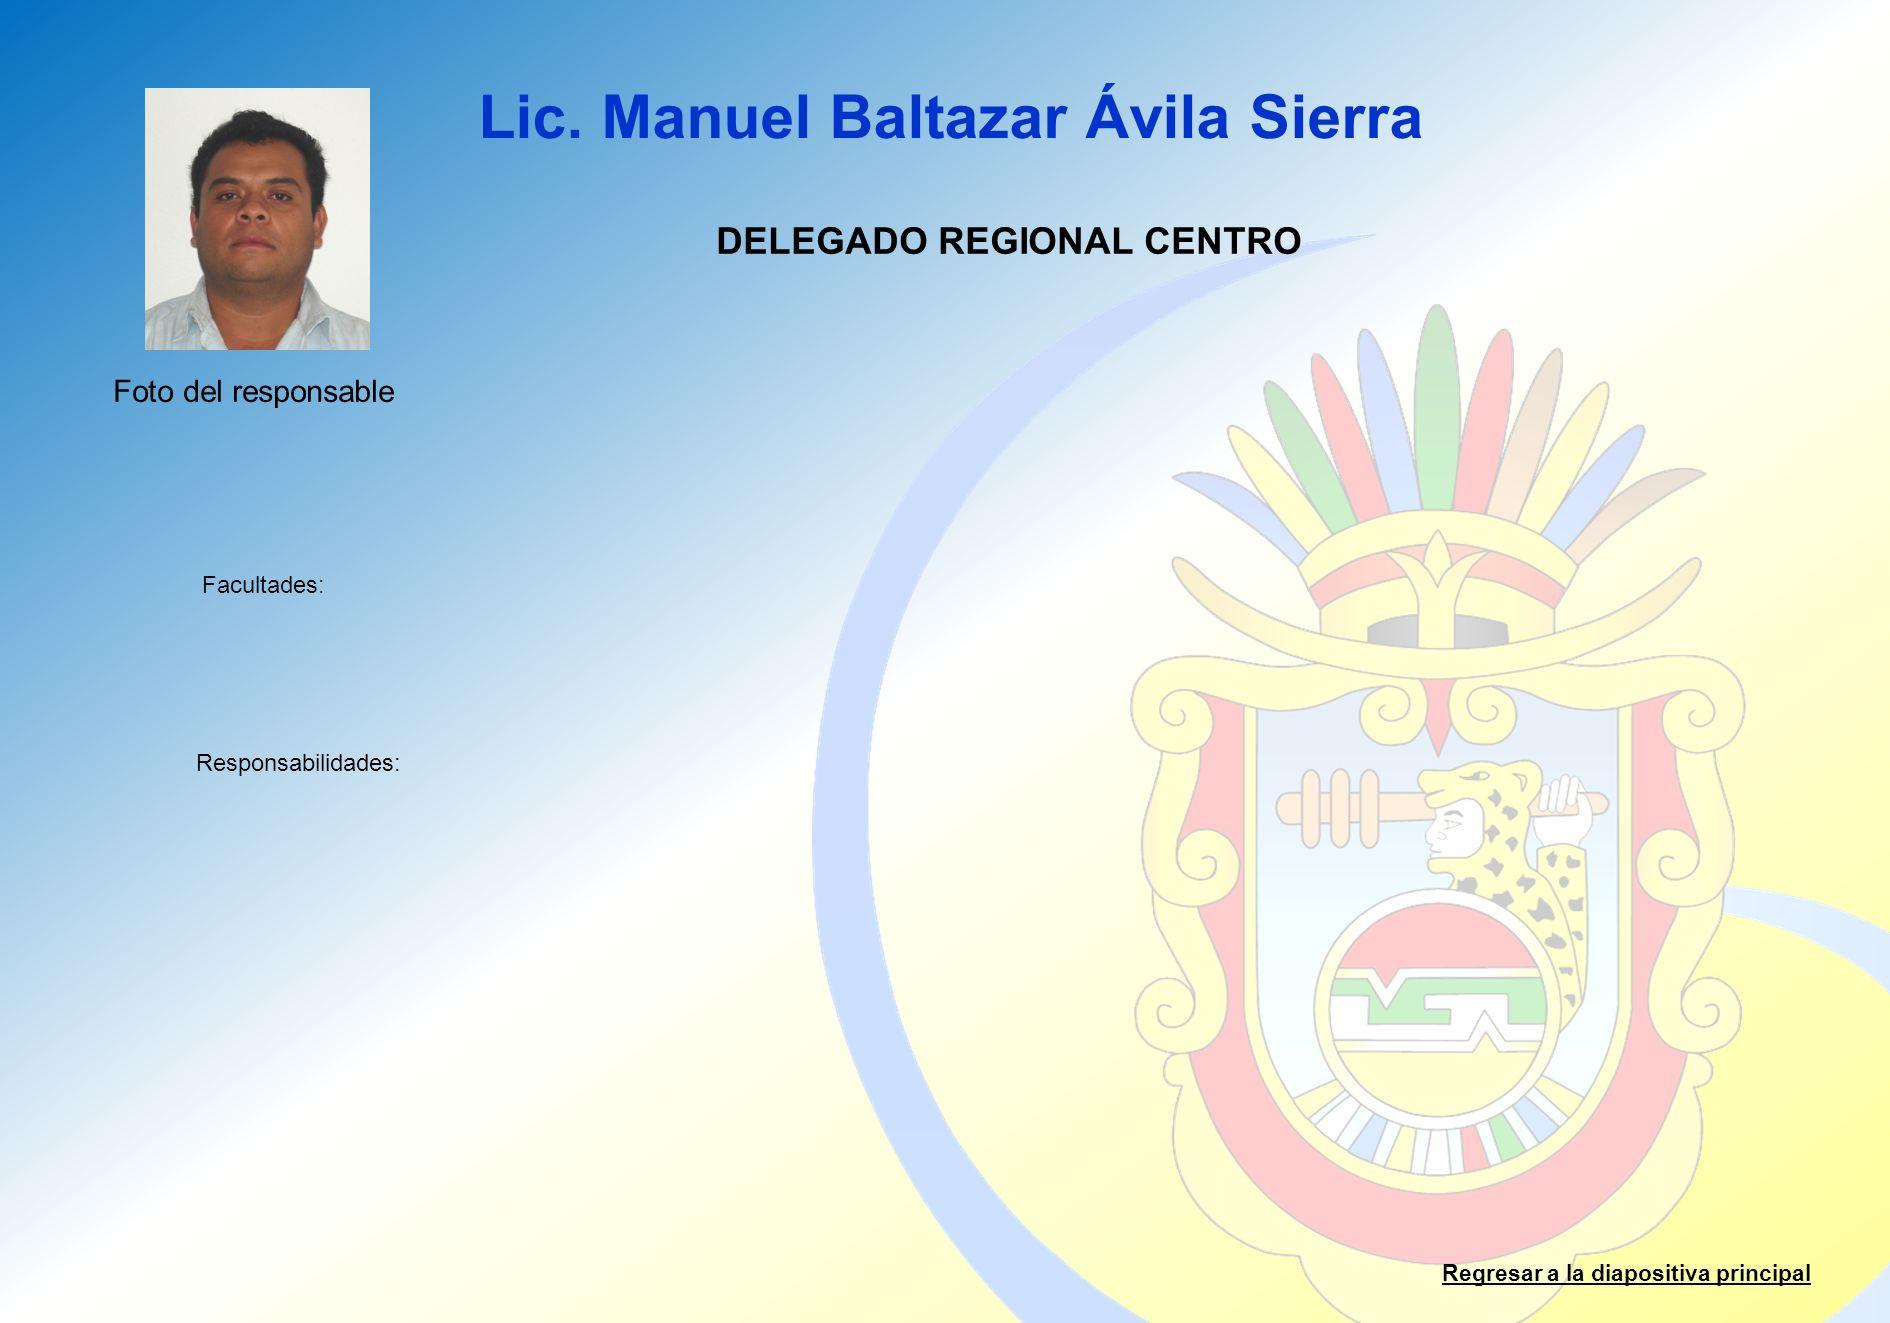 Lic. Manuel Baltazar Ávila Sierra Facultades: Responsabilidades: Regresar a la diapositiva principal DELEGADO REGIONAL CENTRO Foto del responsable